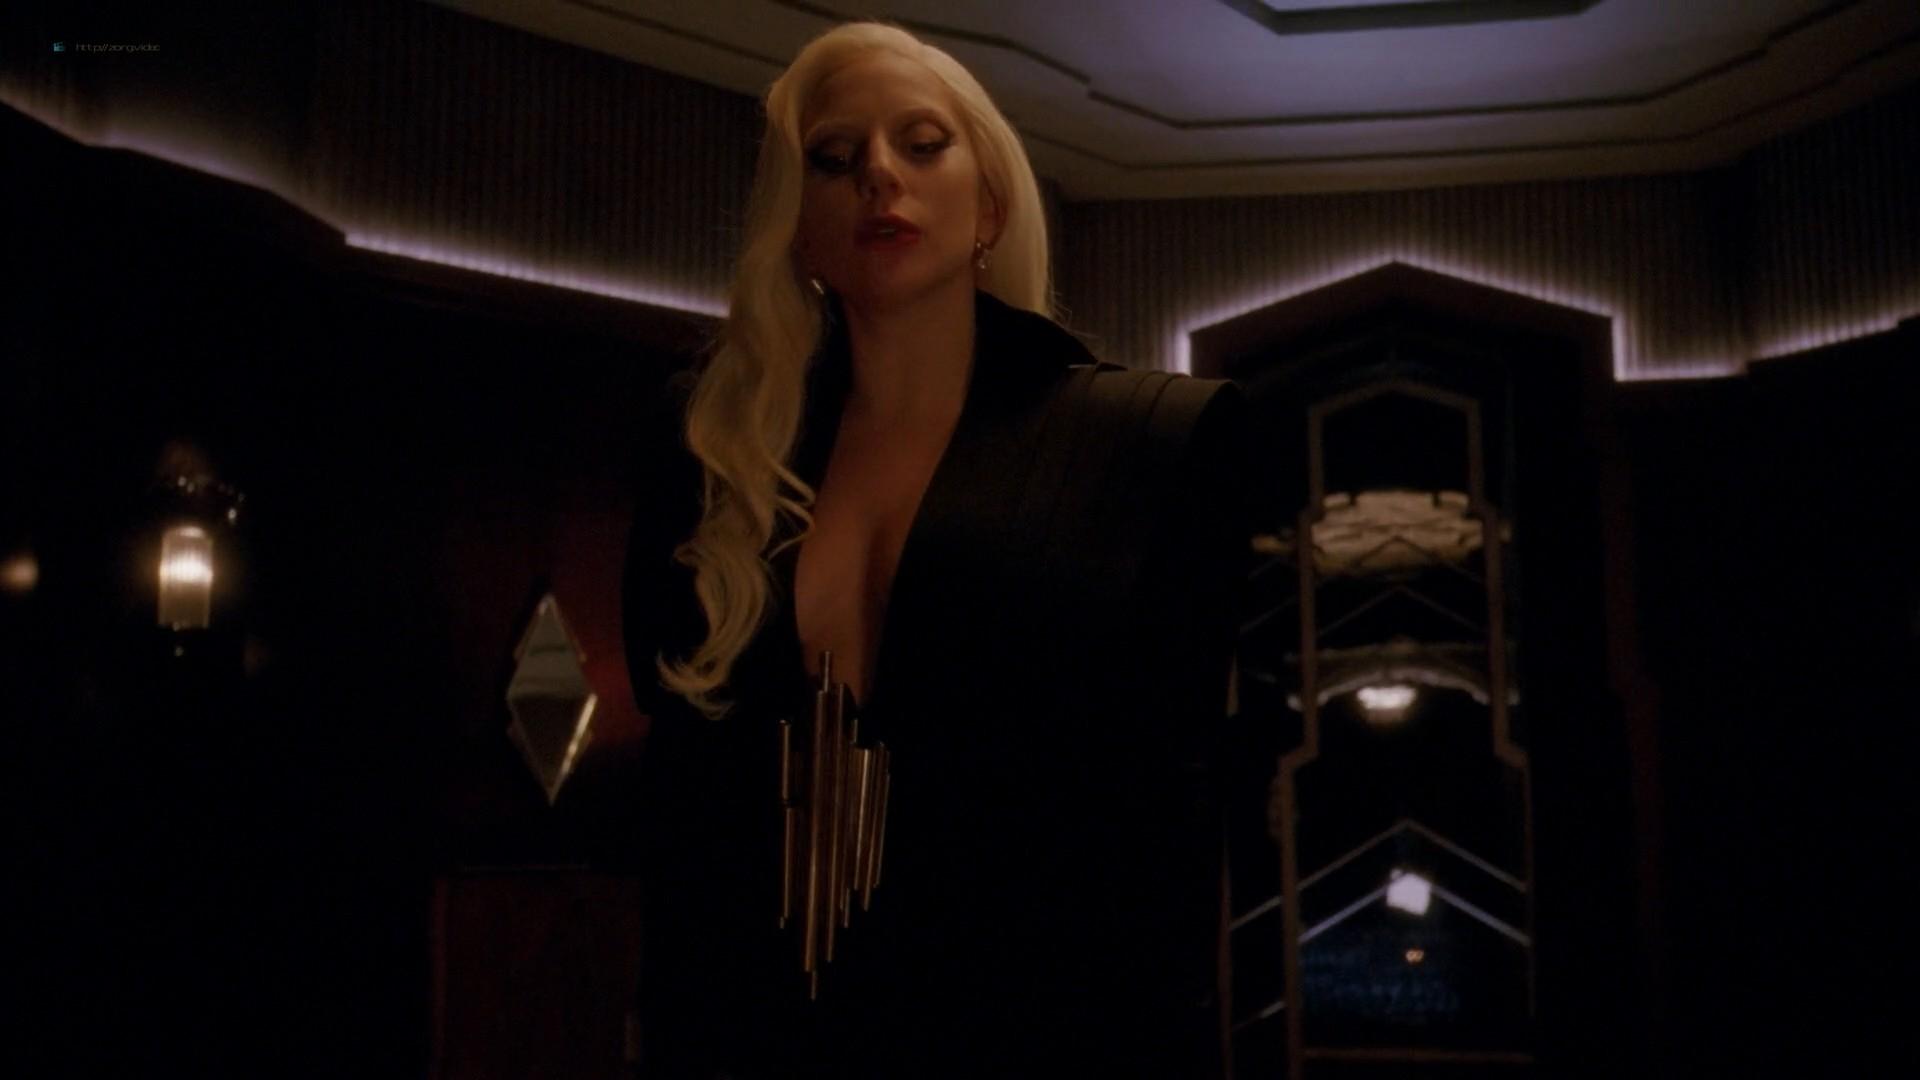 Lady Gaga and Angela Bassett hot lesbian sex - American Horror Story (2015) s5e3 HD 1080p (13)